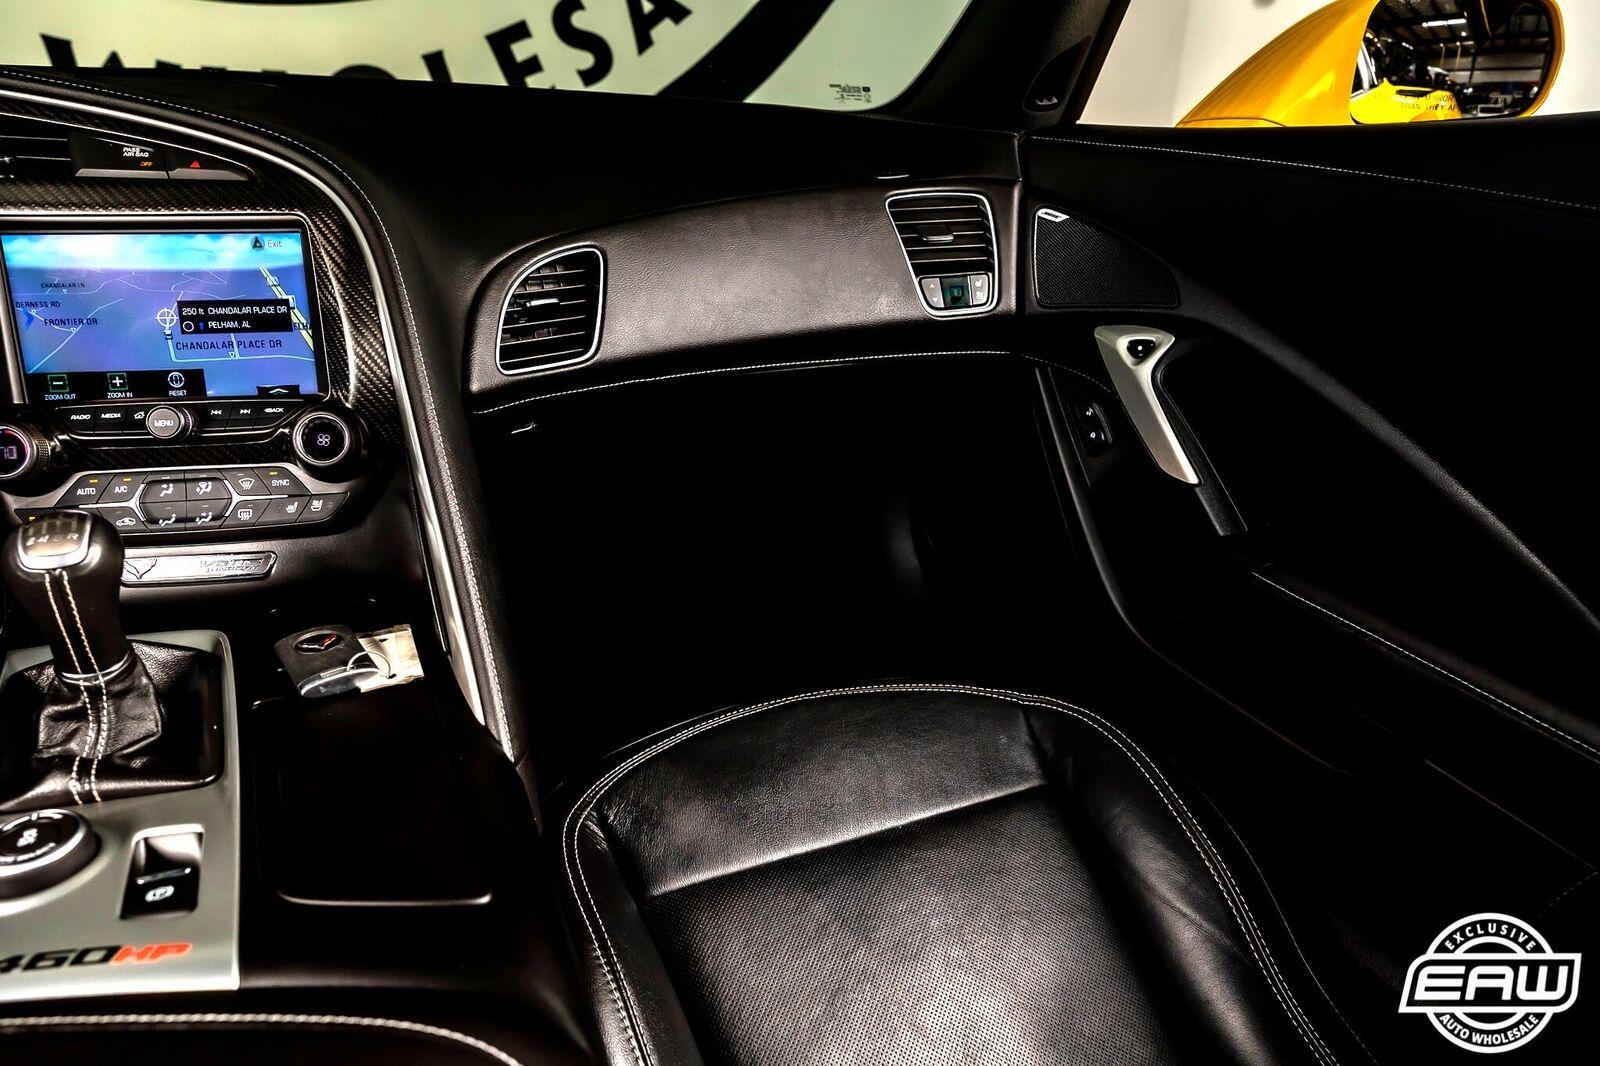 2014 Yellow Chevrolet Corvette Coupe 2LT   C7 Corvette Photo 8